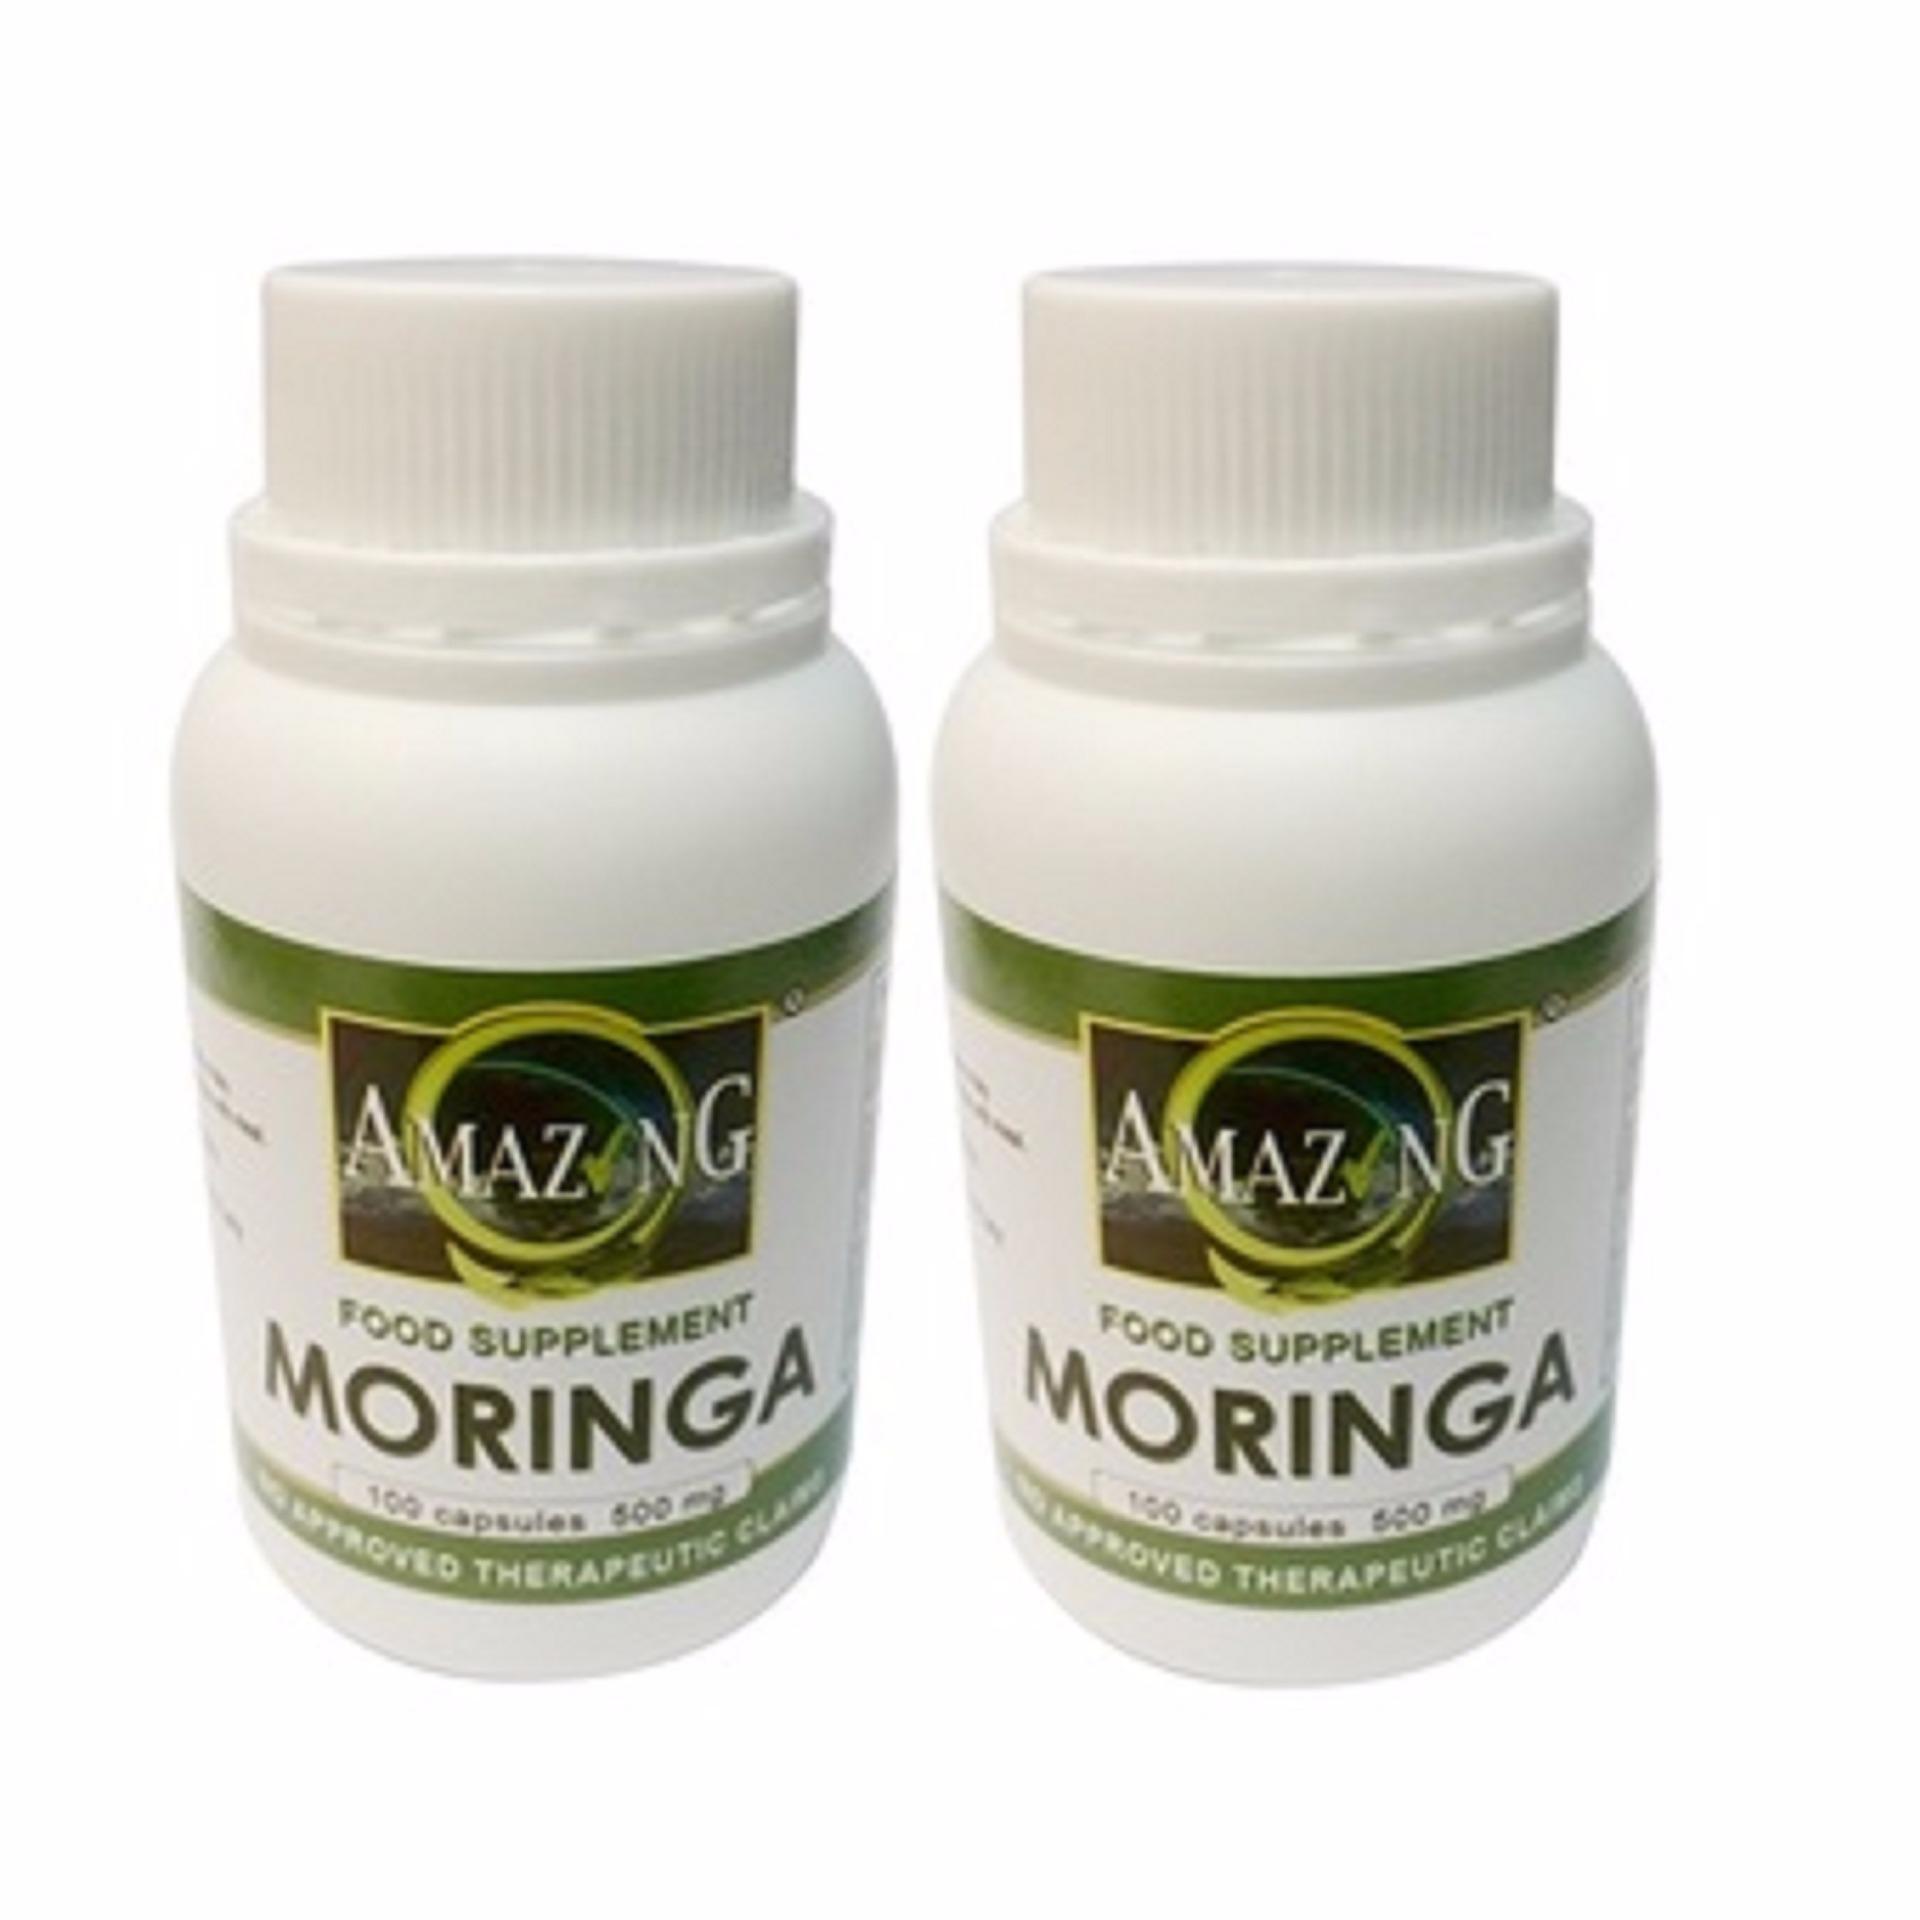 Amazing Food Supplement Moringa 500mg Capsules Bottle of 100 Setof2